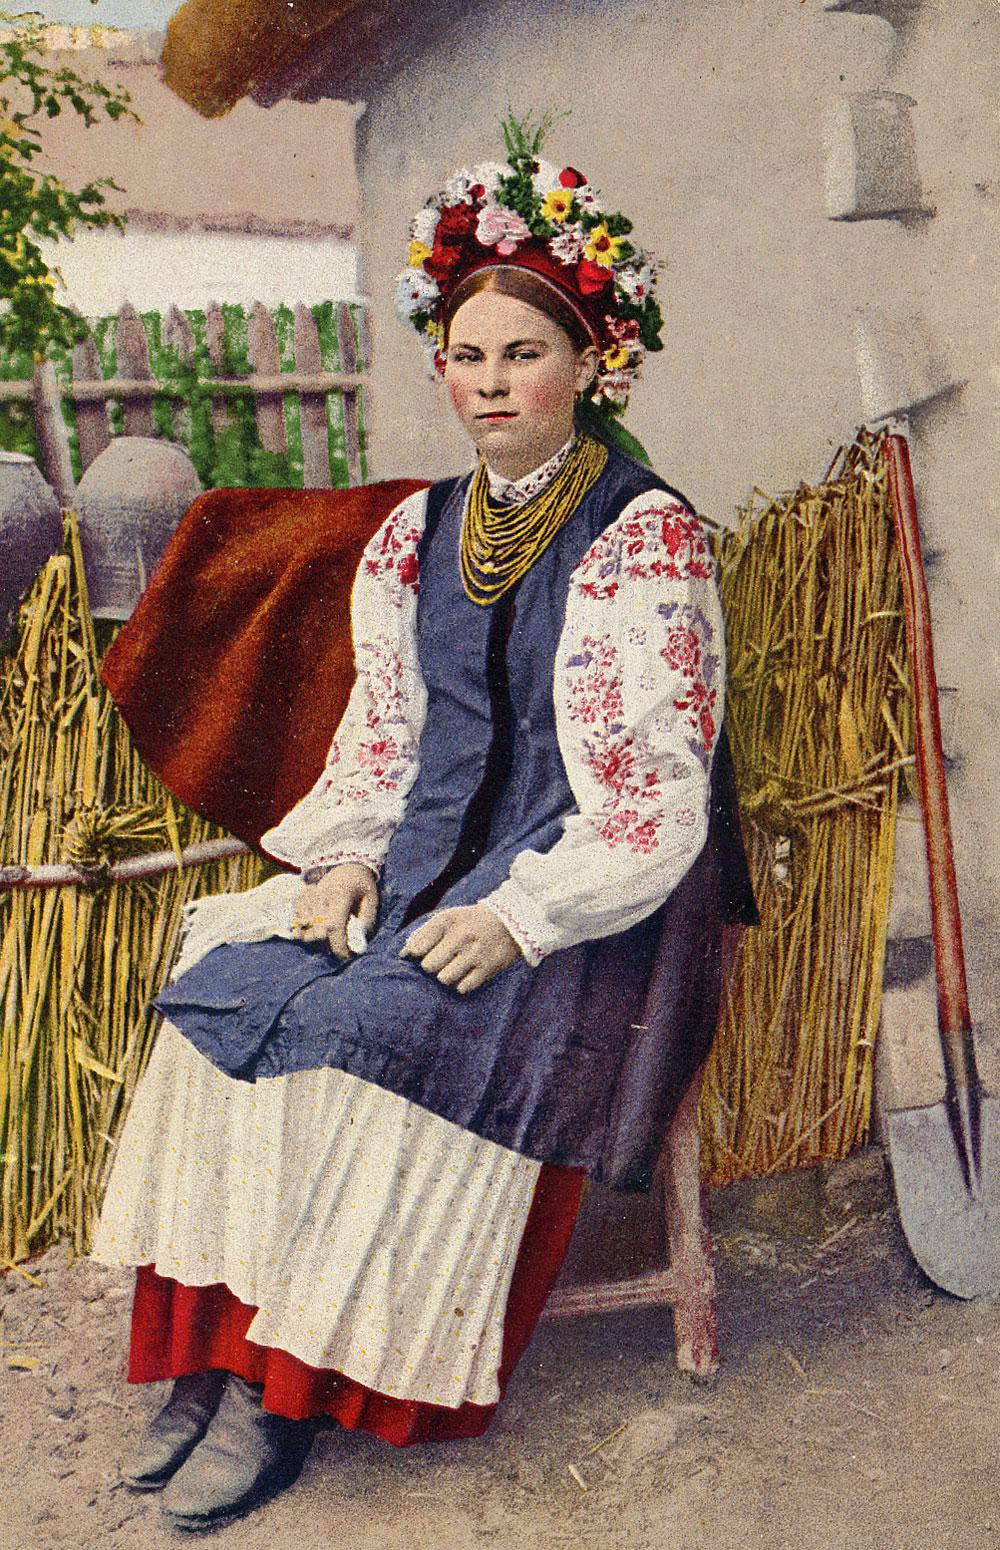 Ethnic groups: Vyshivanka, Ukrainian Dress